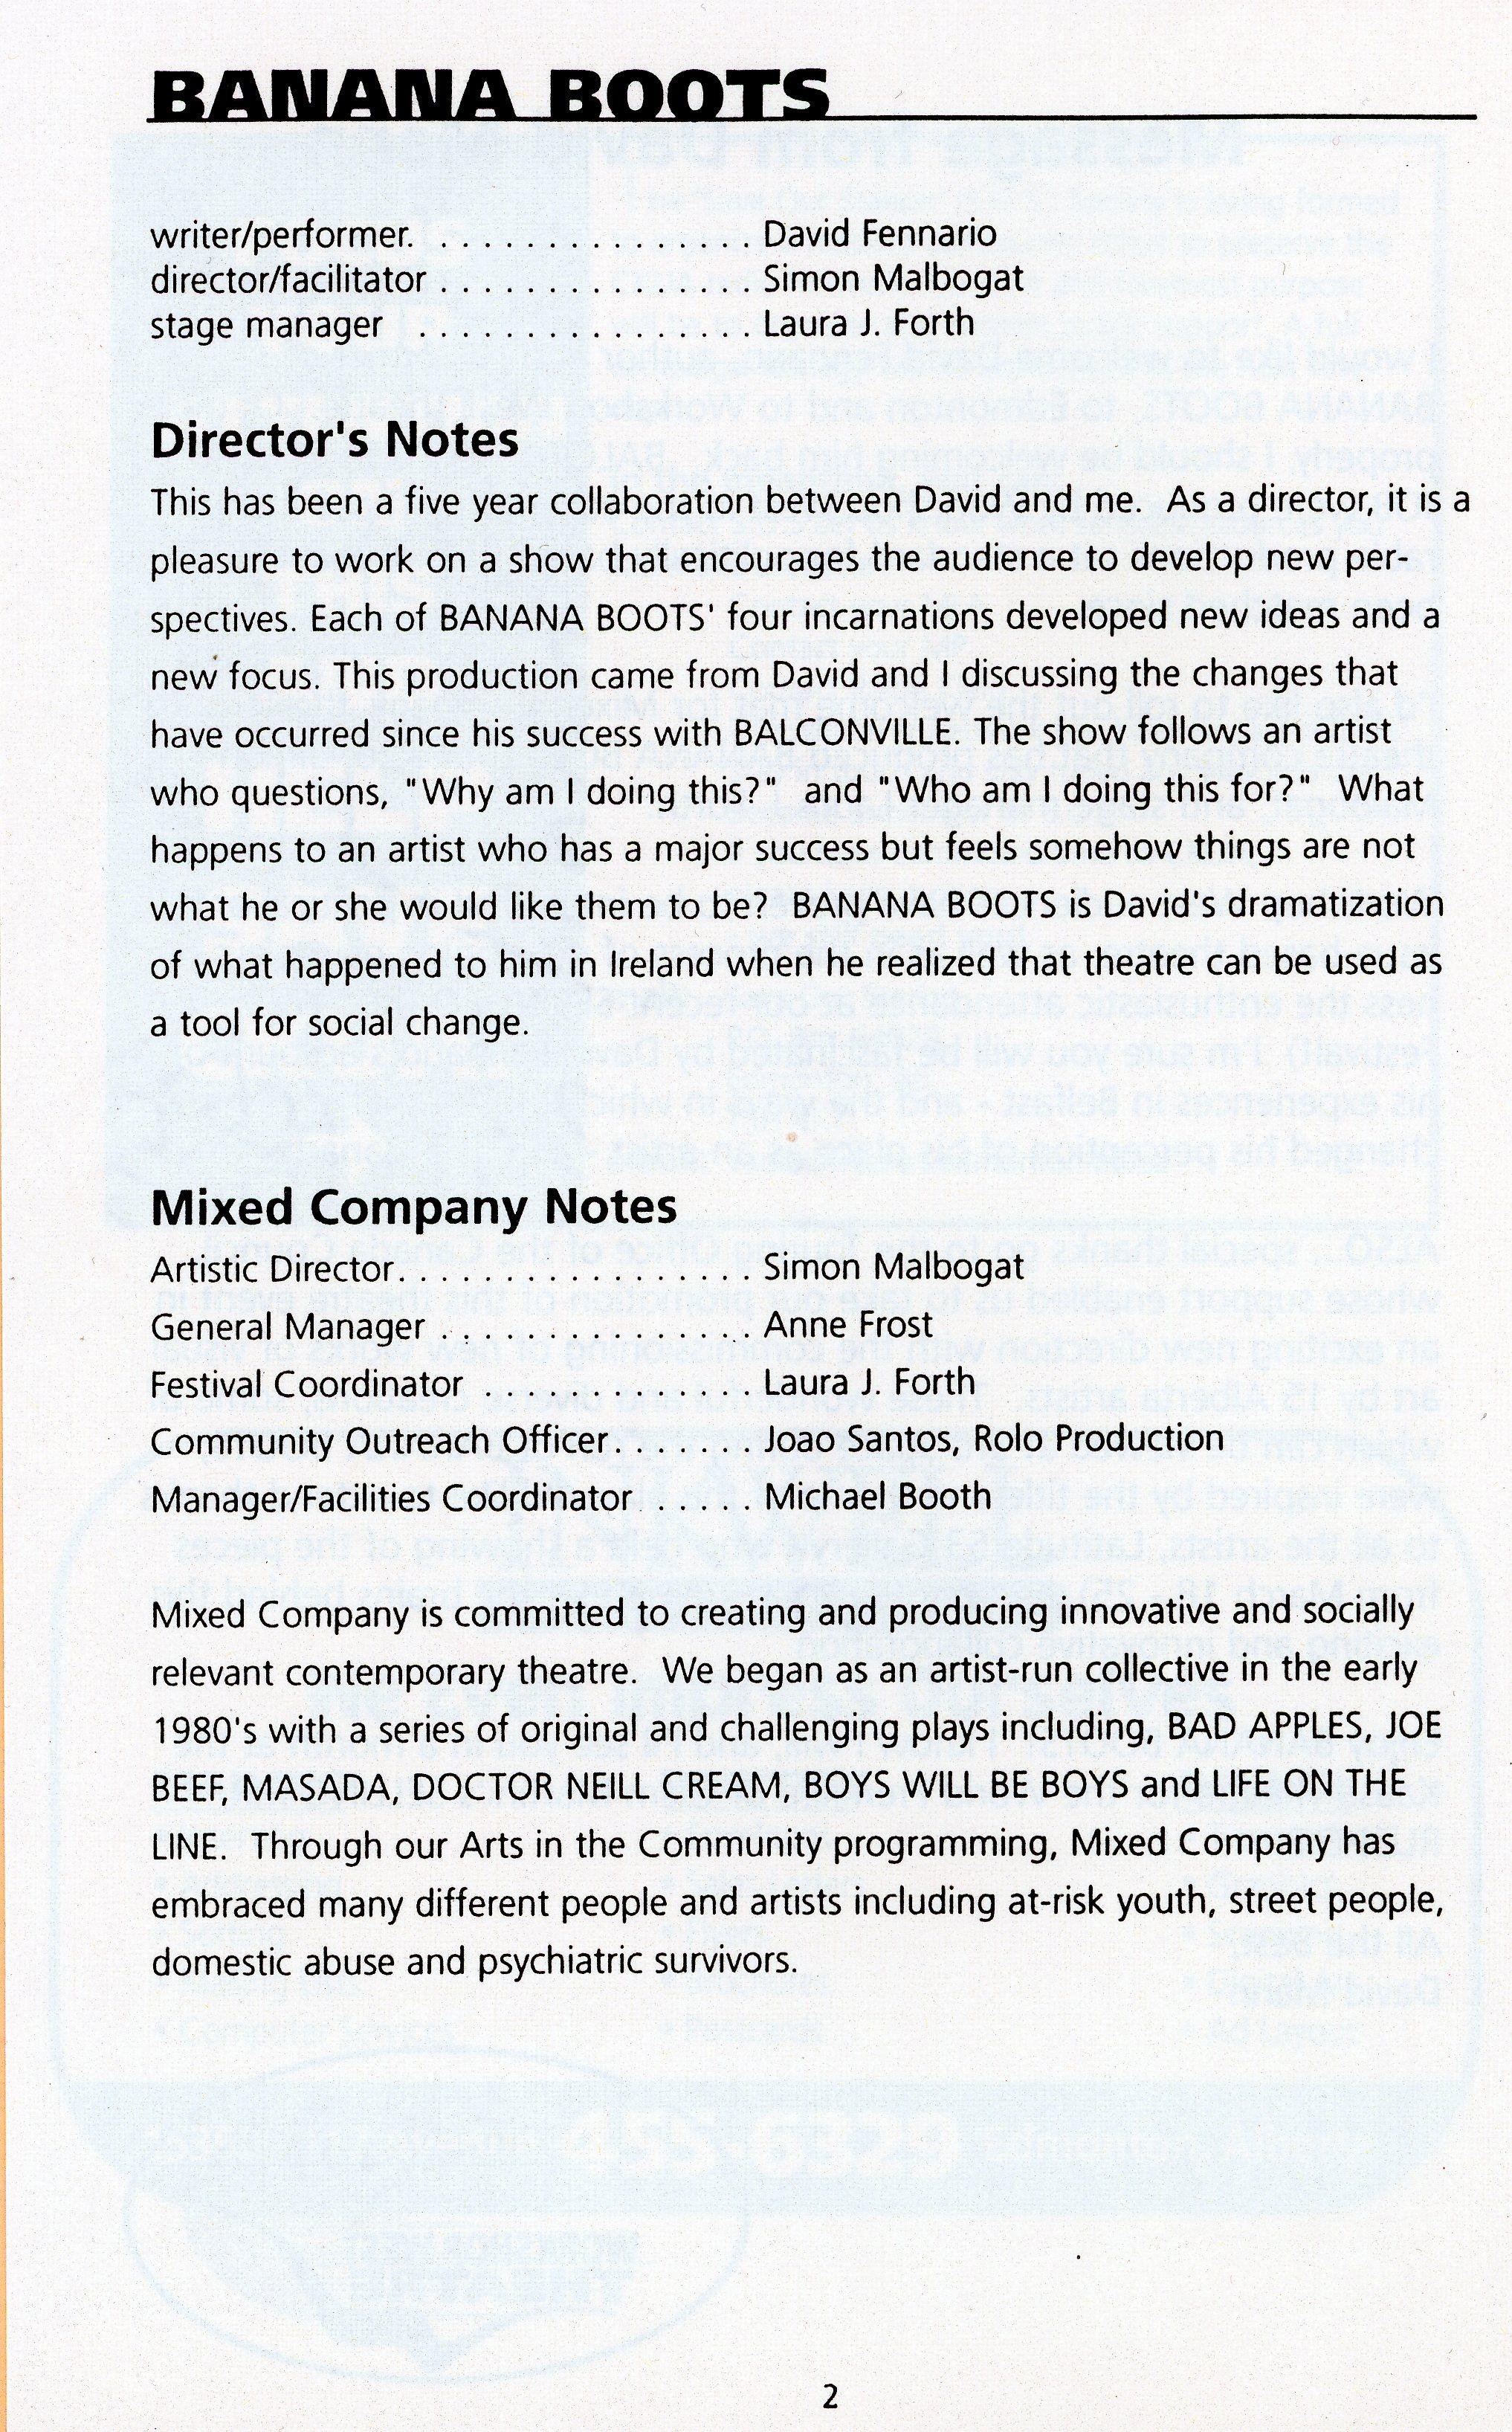 Banana Boots (March, 1997)- Production Information_JPEG.jpg